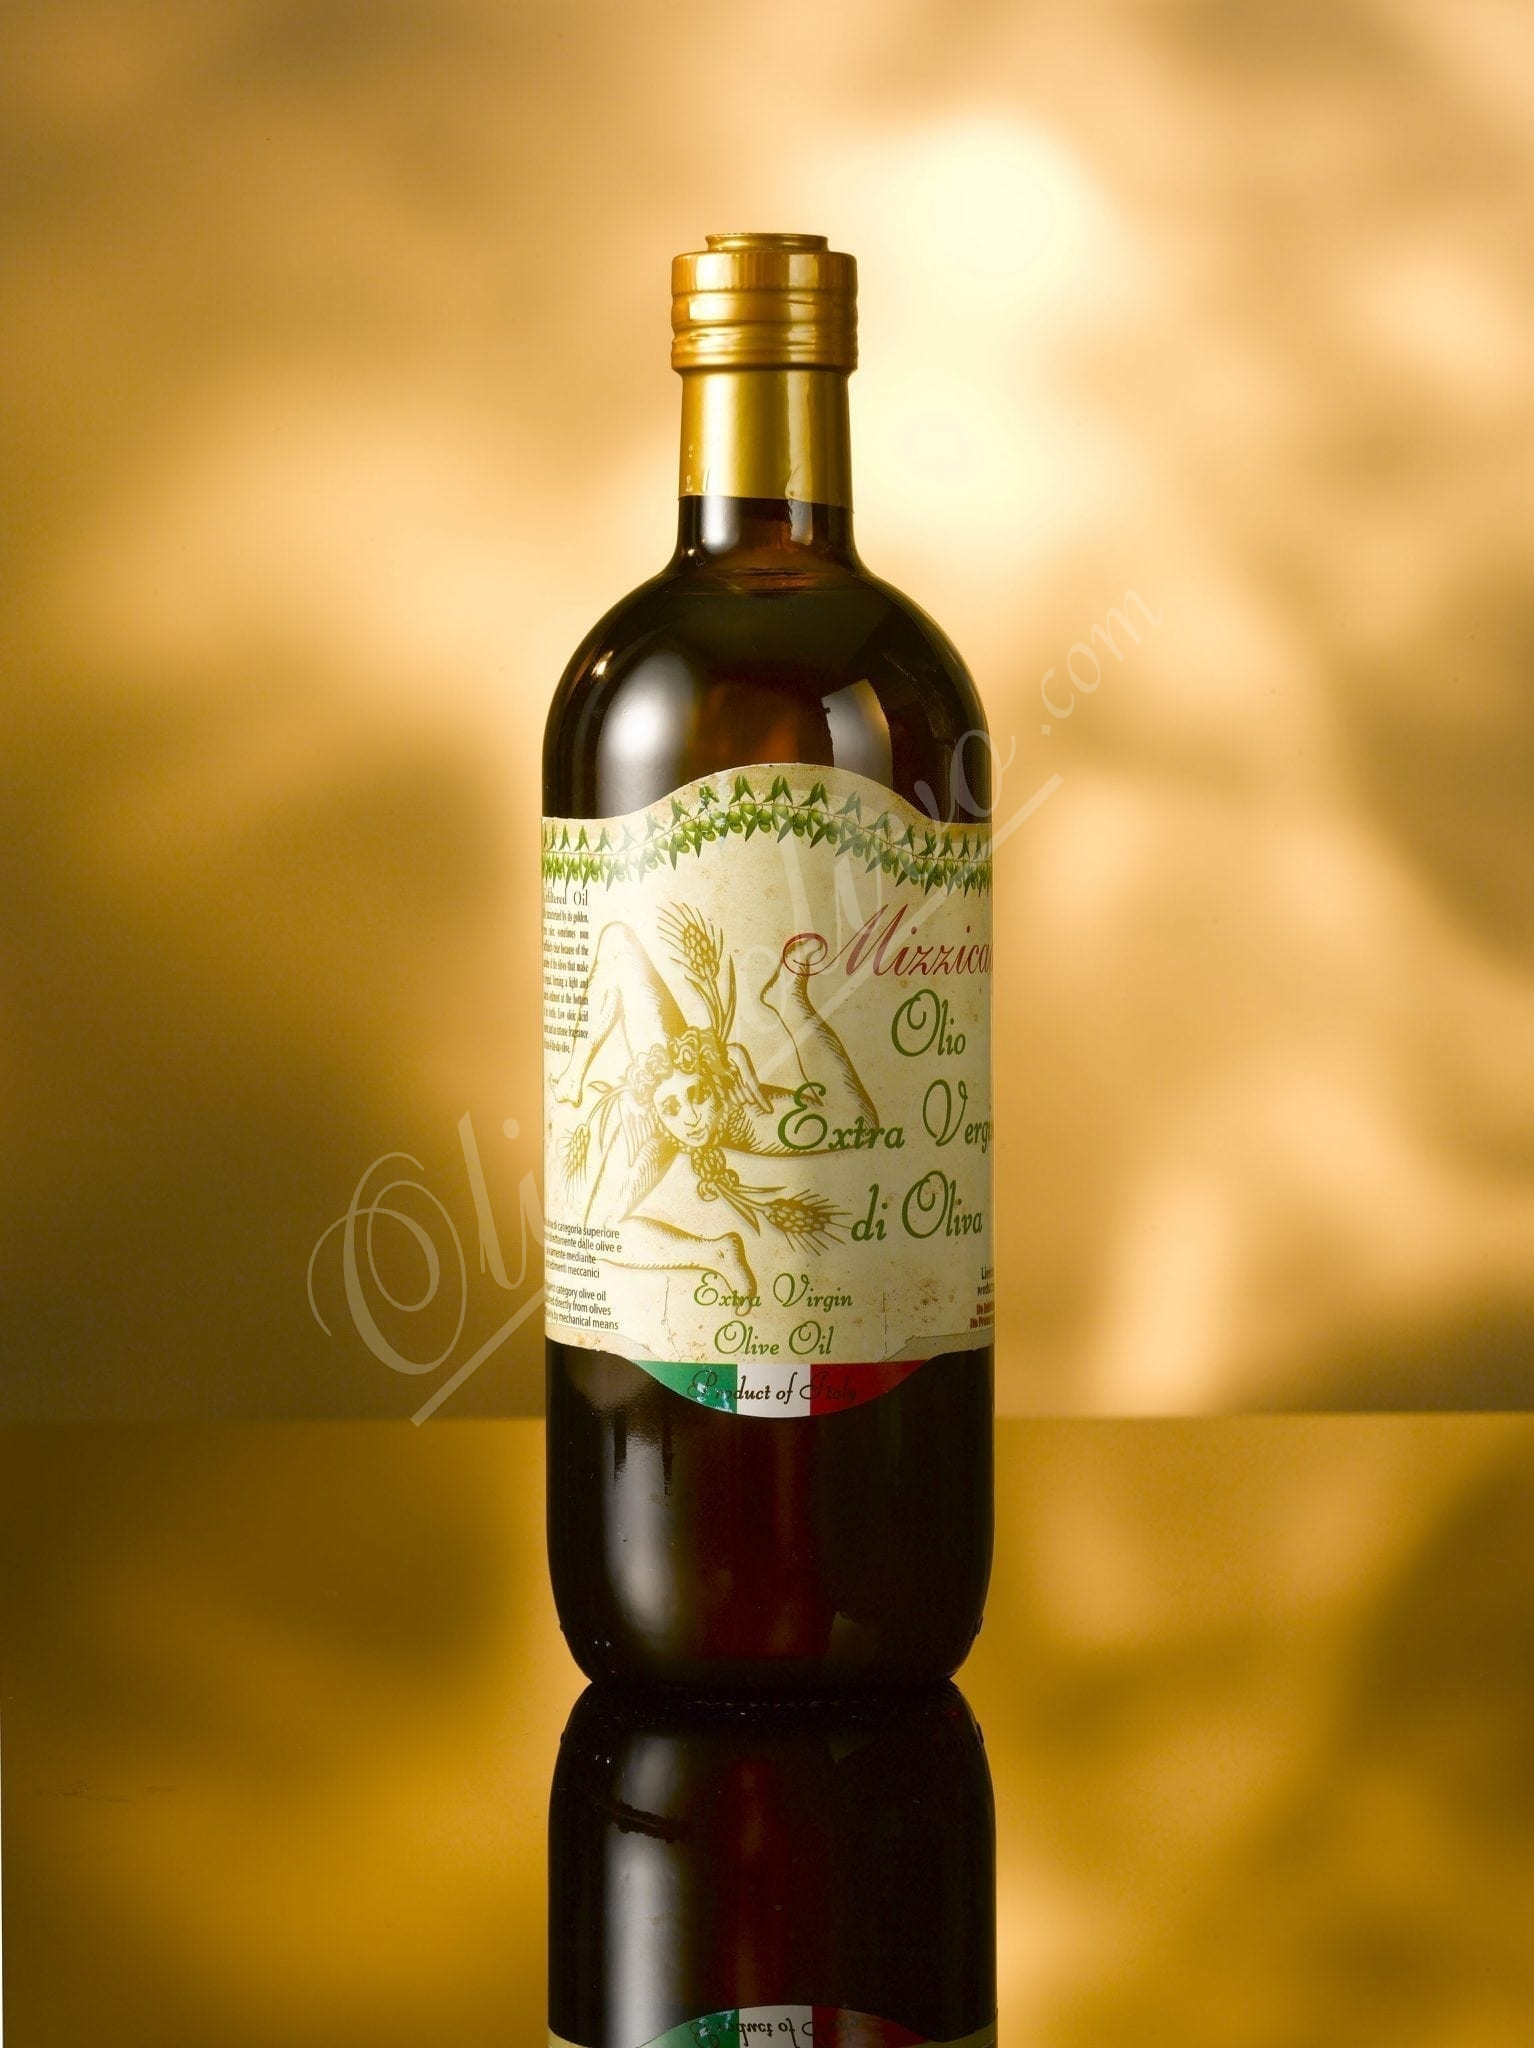 Mizzicaa, Santangelo, olive oil, blend, Sicily, 1000 ml